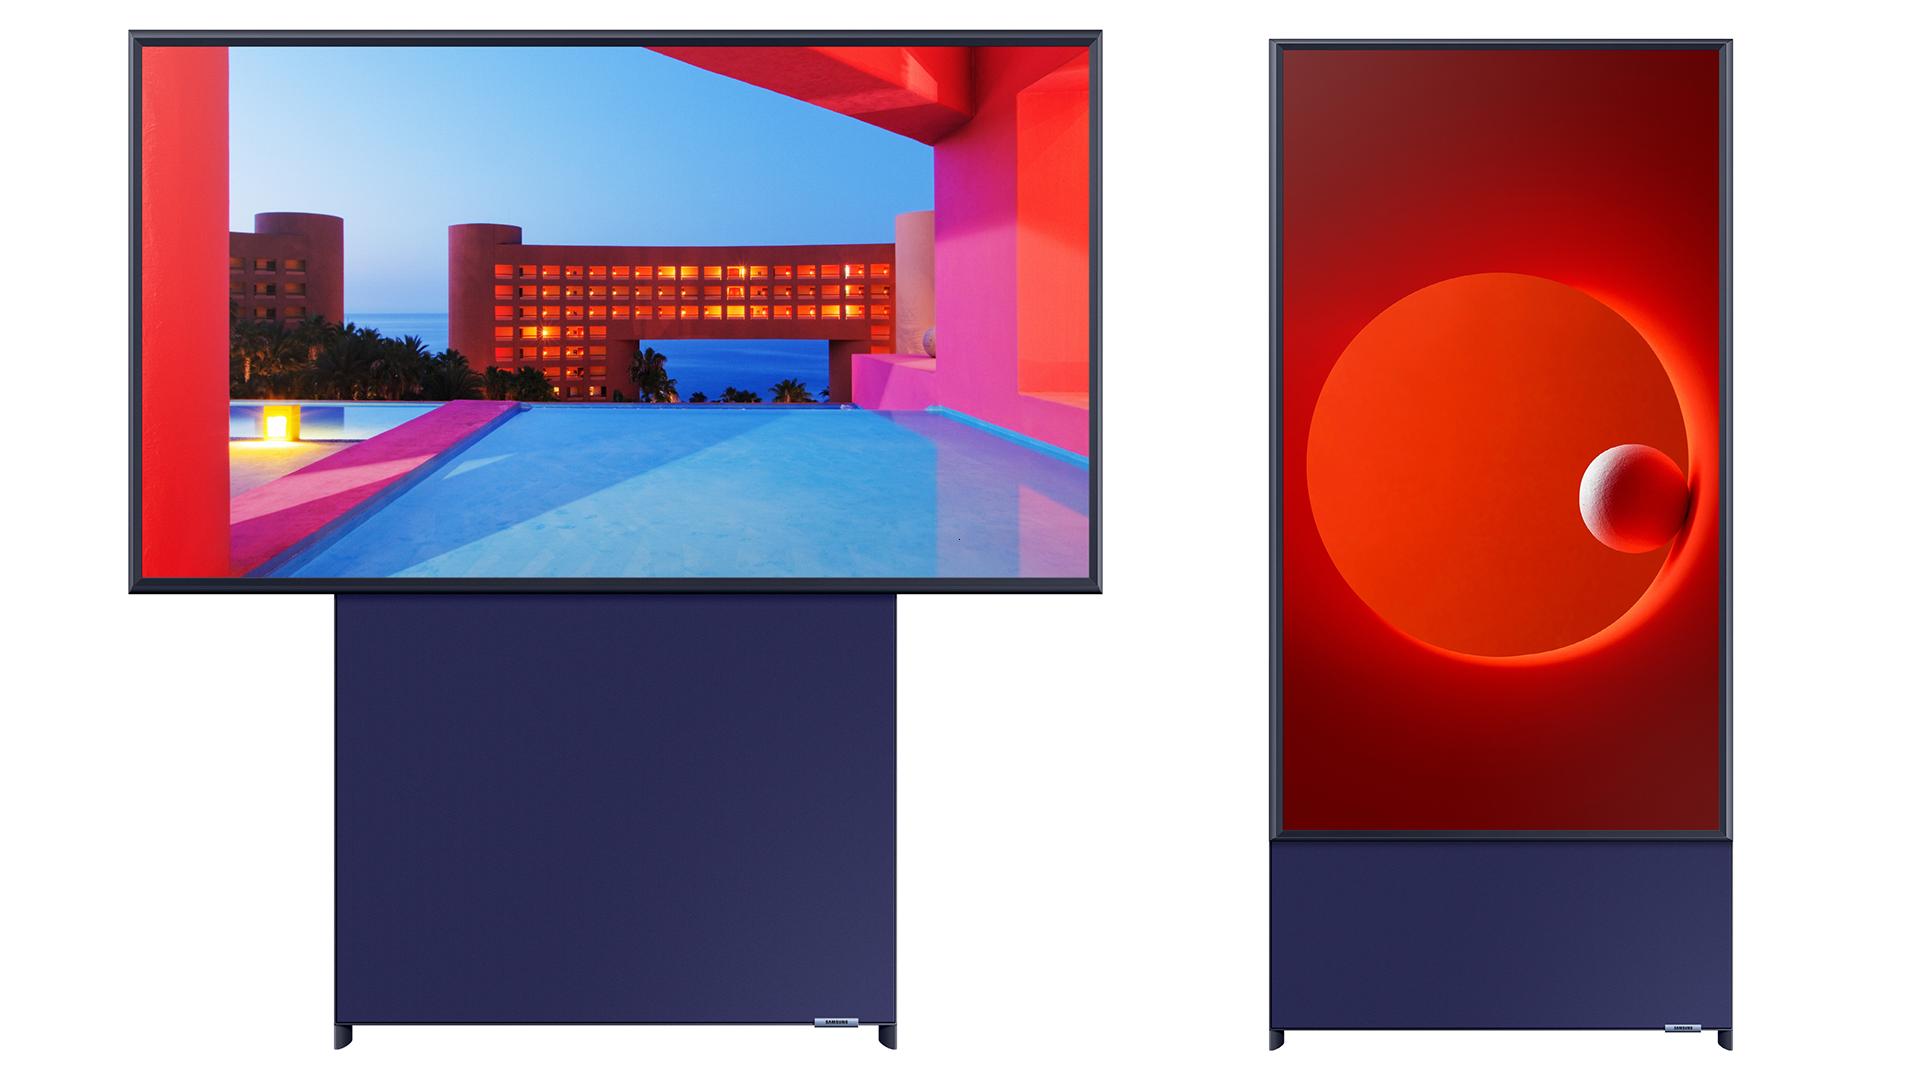 The Samsung Auto-Rotating 8K TV.